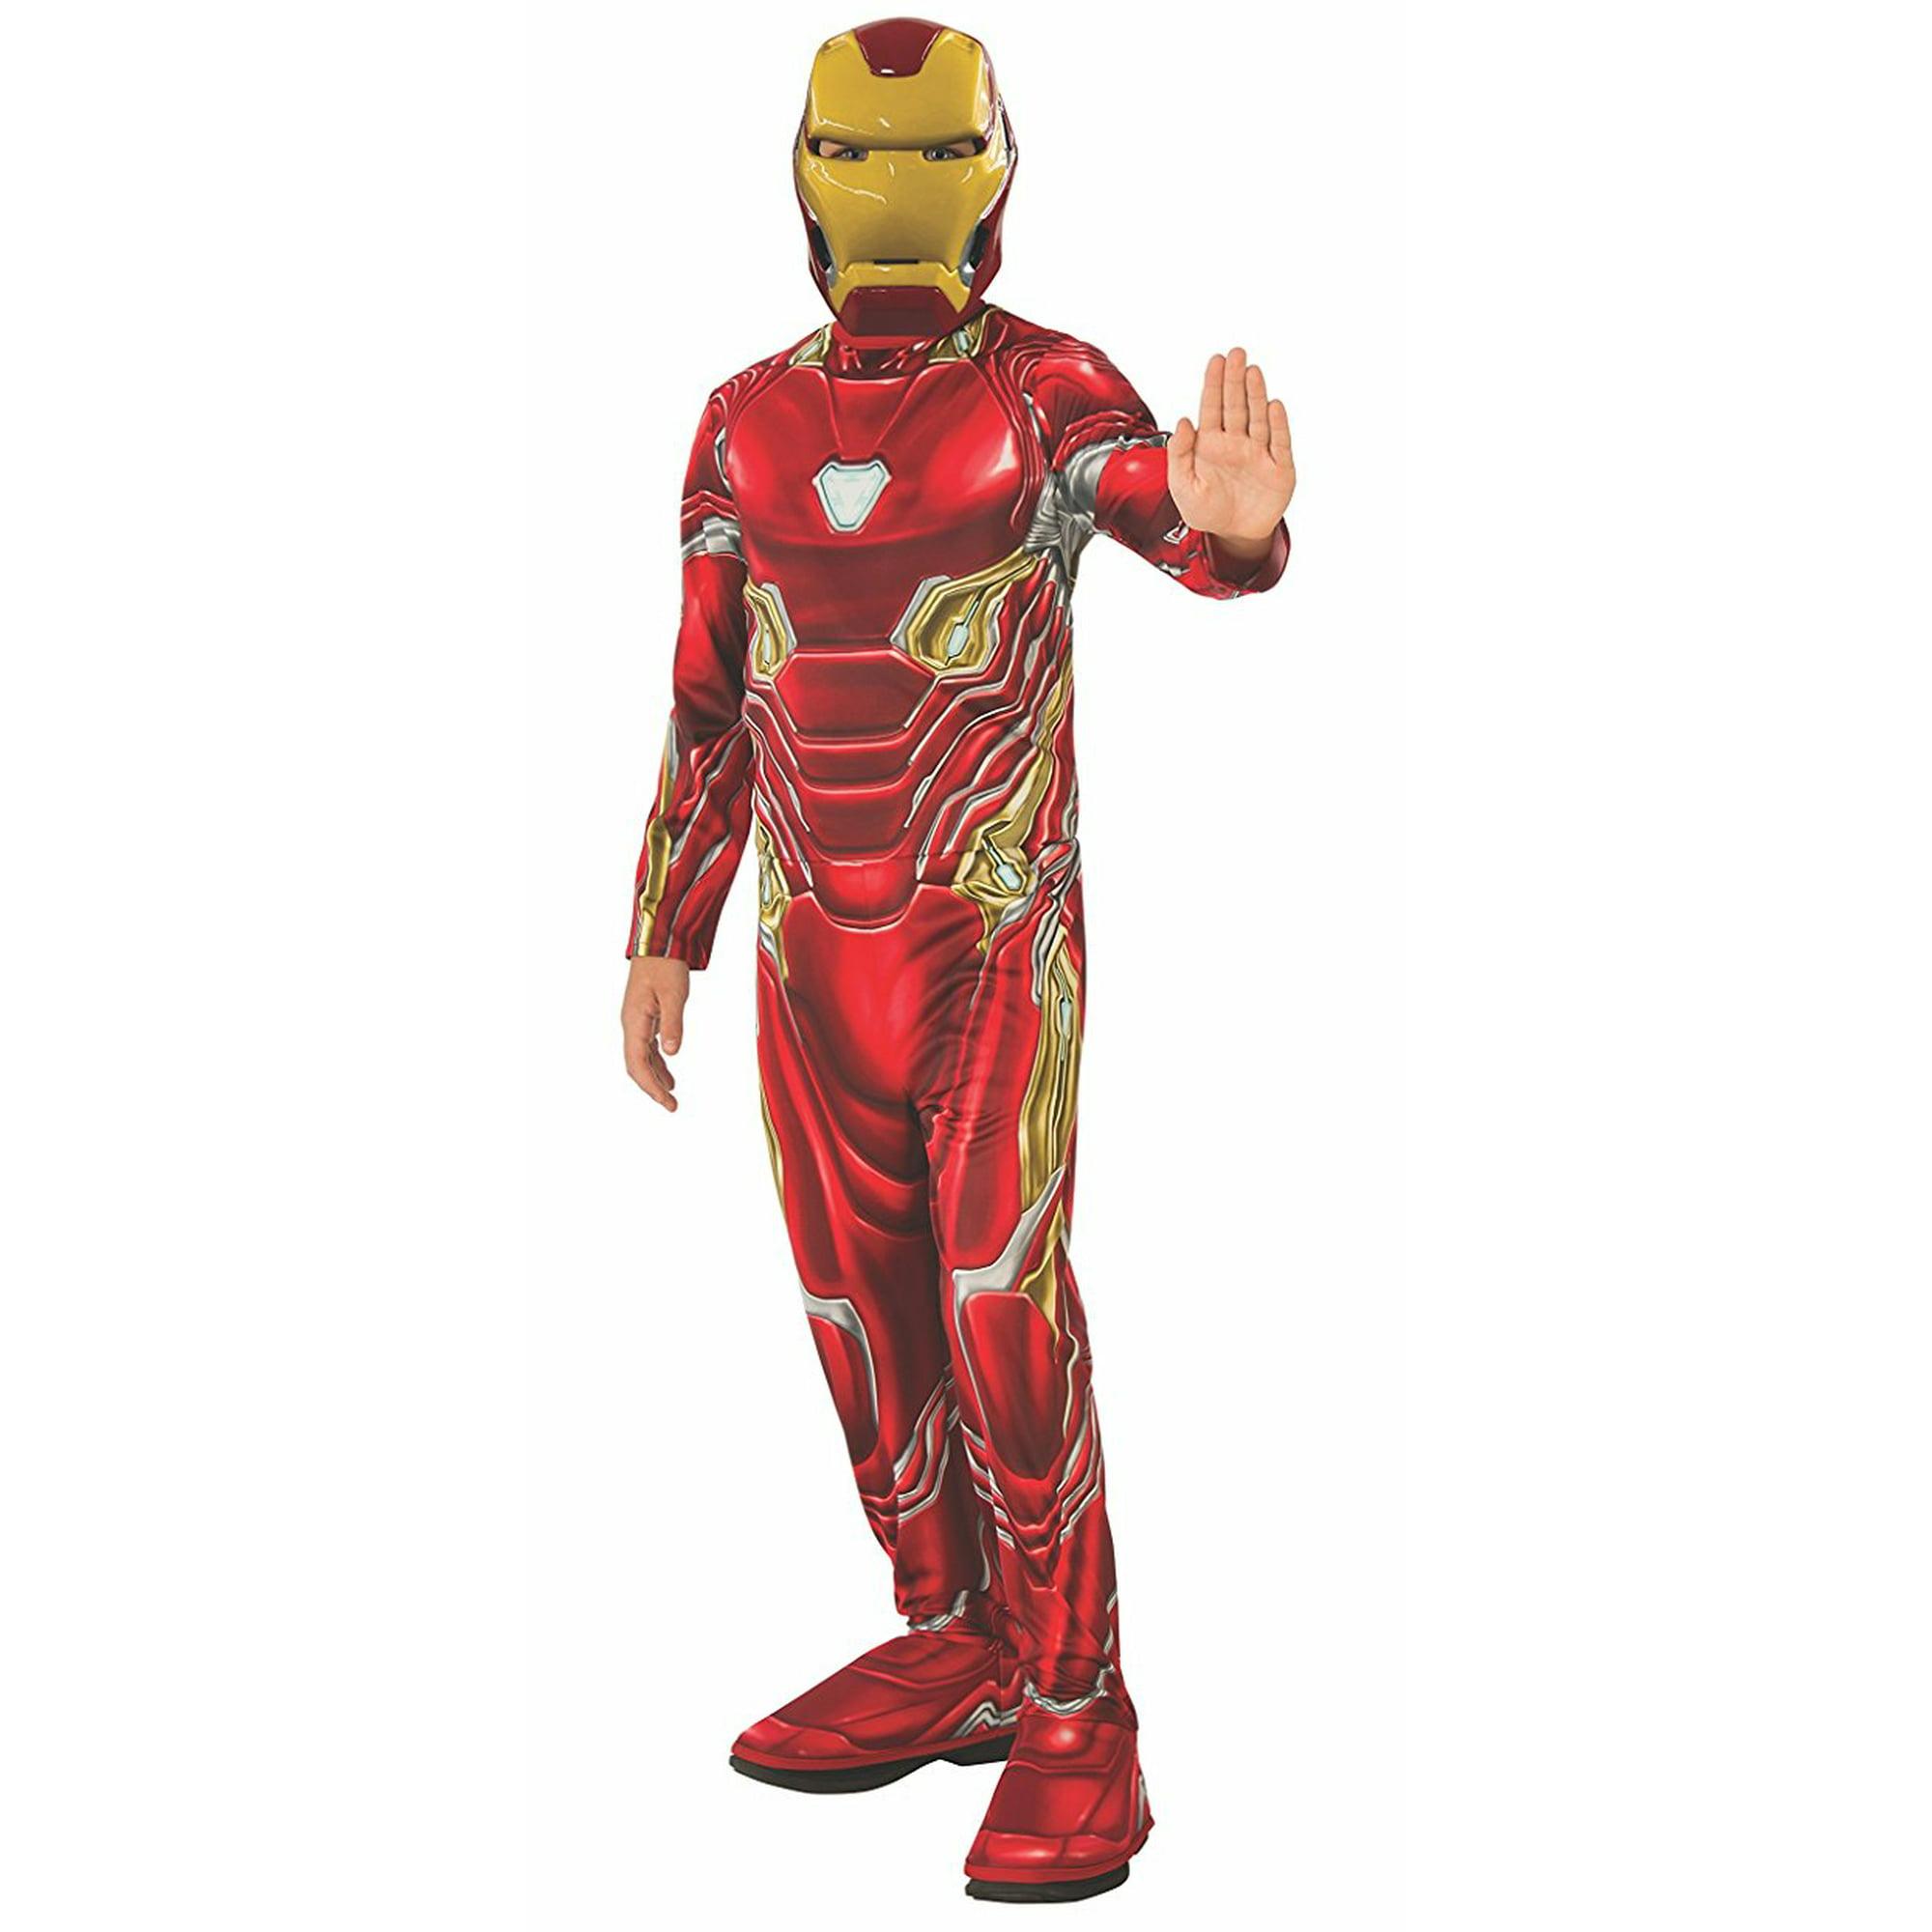 Marvel Avengers: Infinity War Iron Man Child Costume, Medium